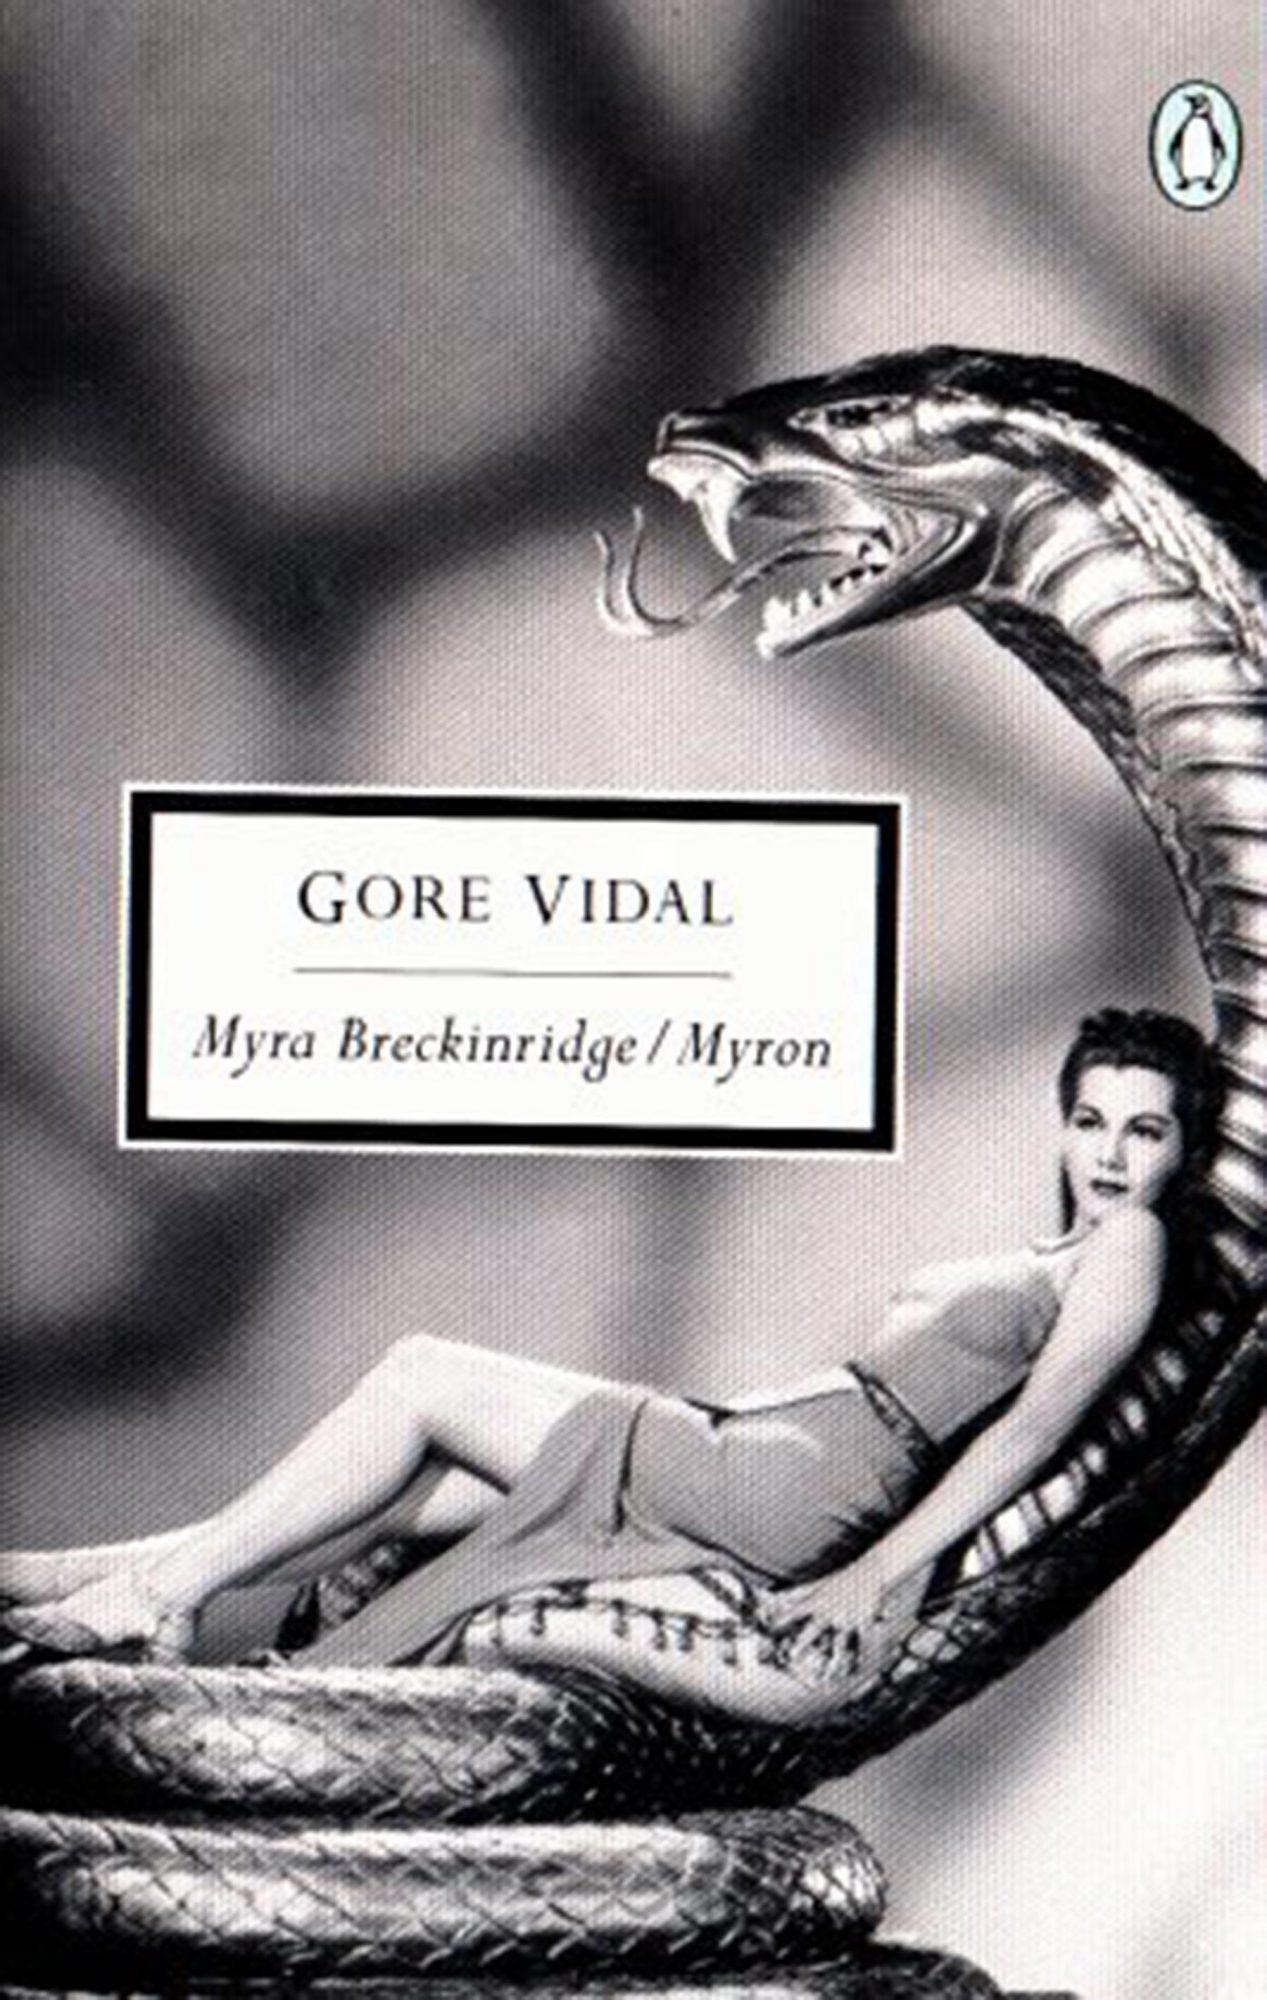 Myra Breckinridge, by Gore Vidal